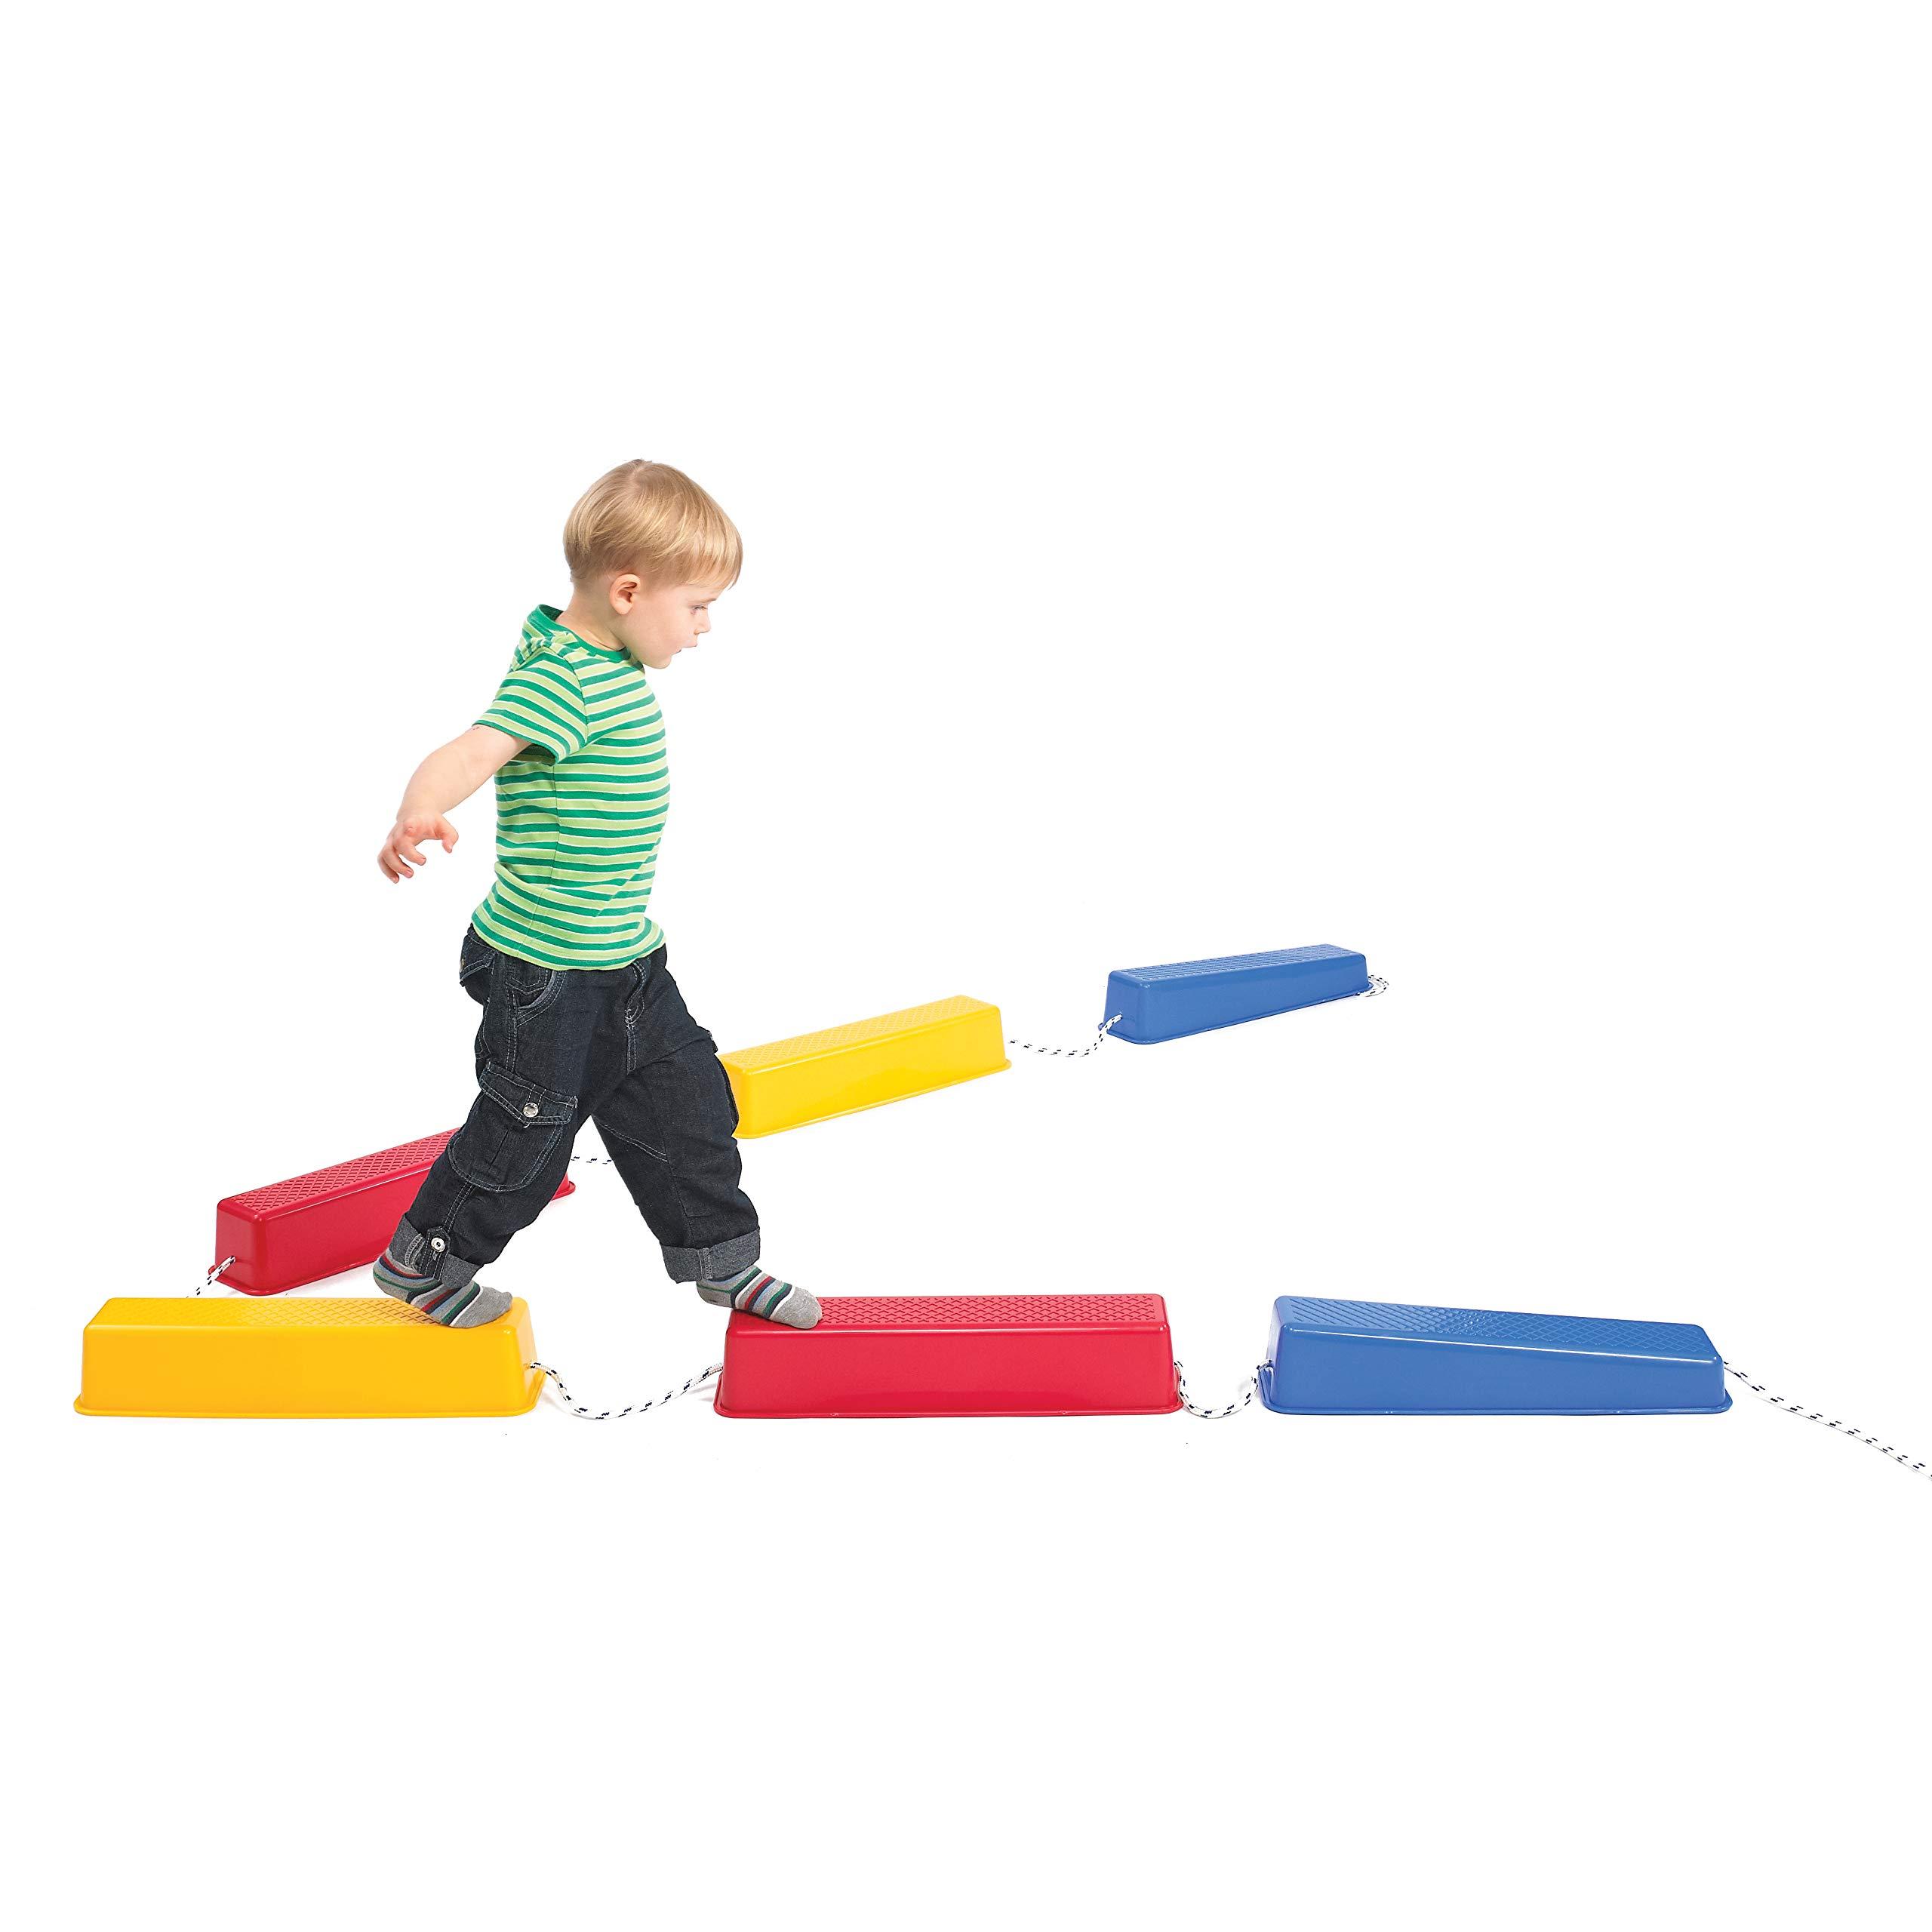 Edx Education Step-a-Logs - Balance Beam for Kids